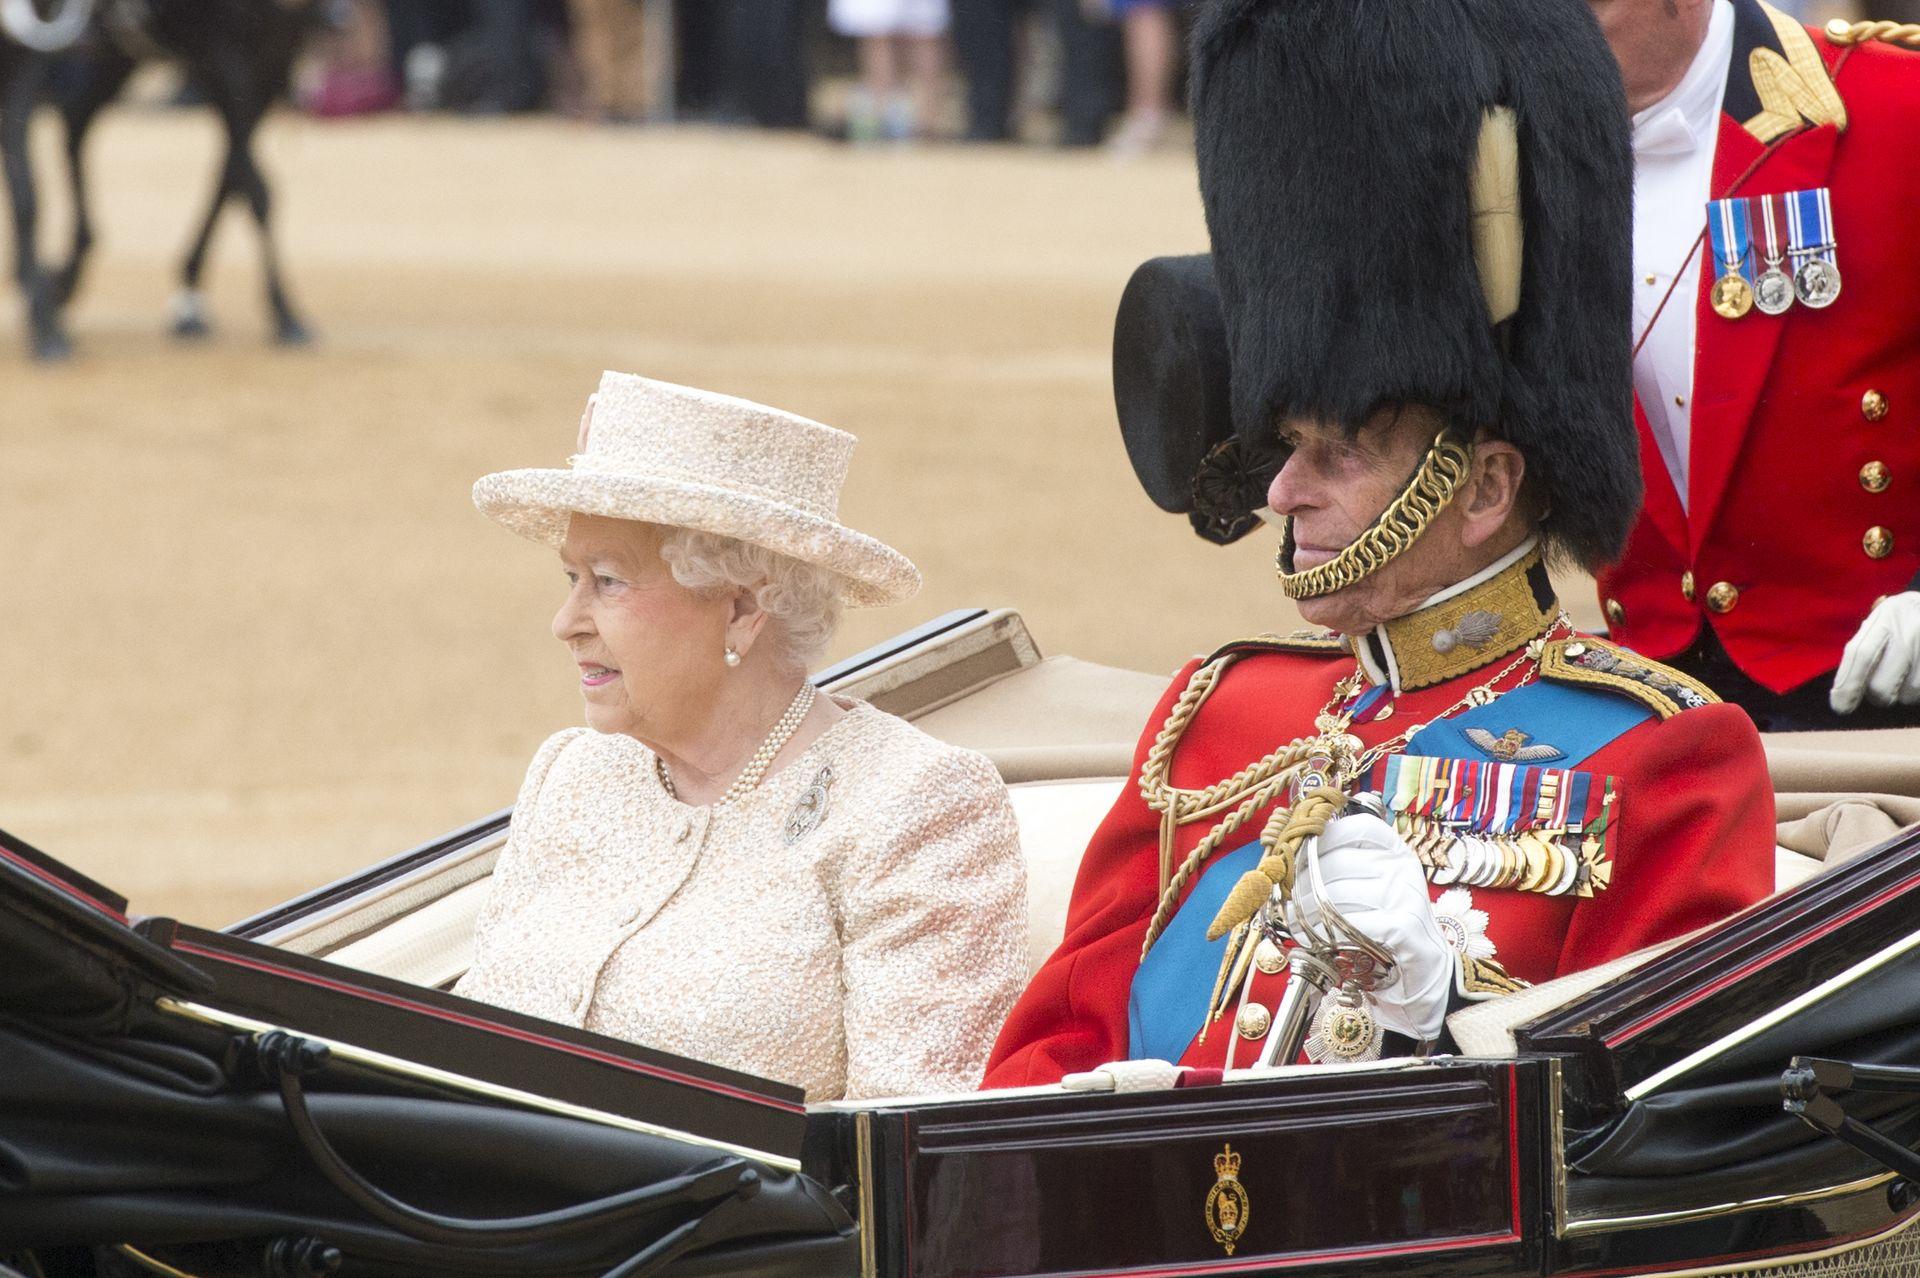 Statement upon the death of The Duke of Edinburgh